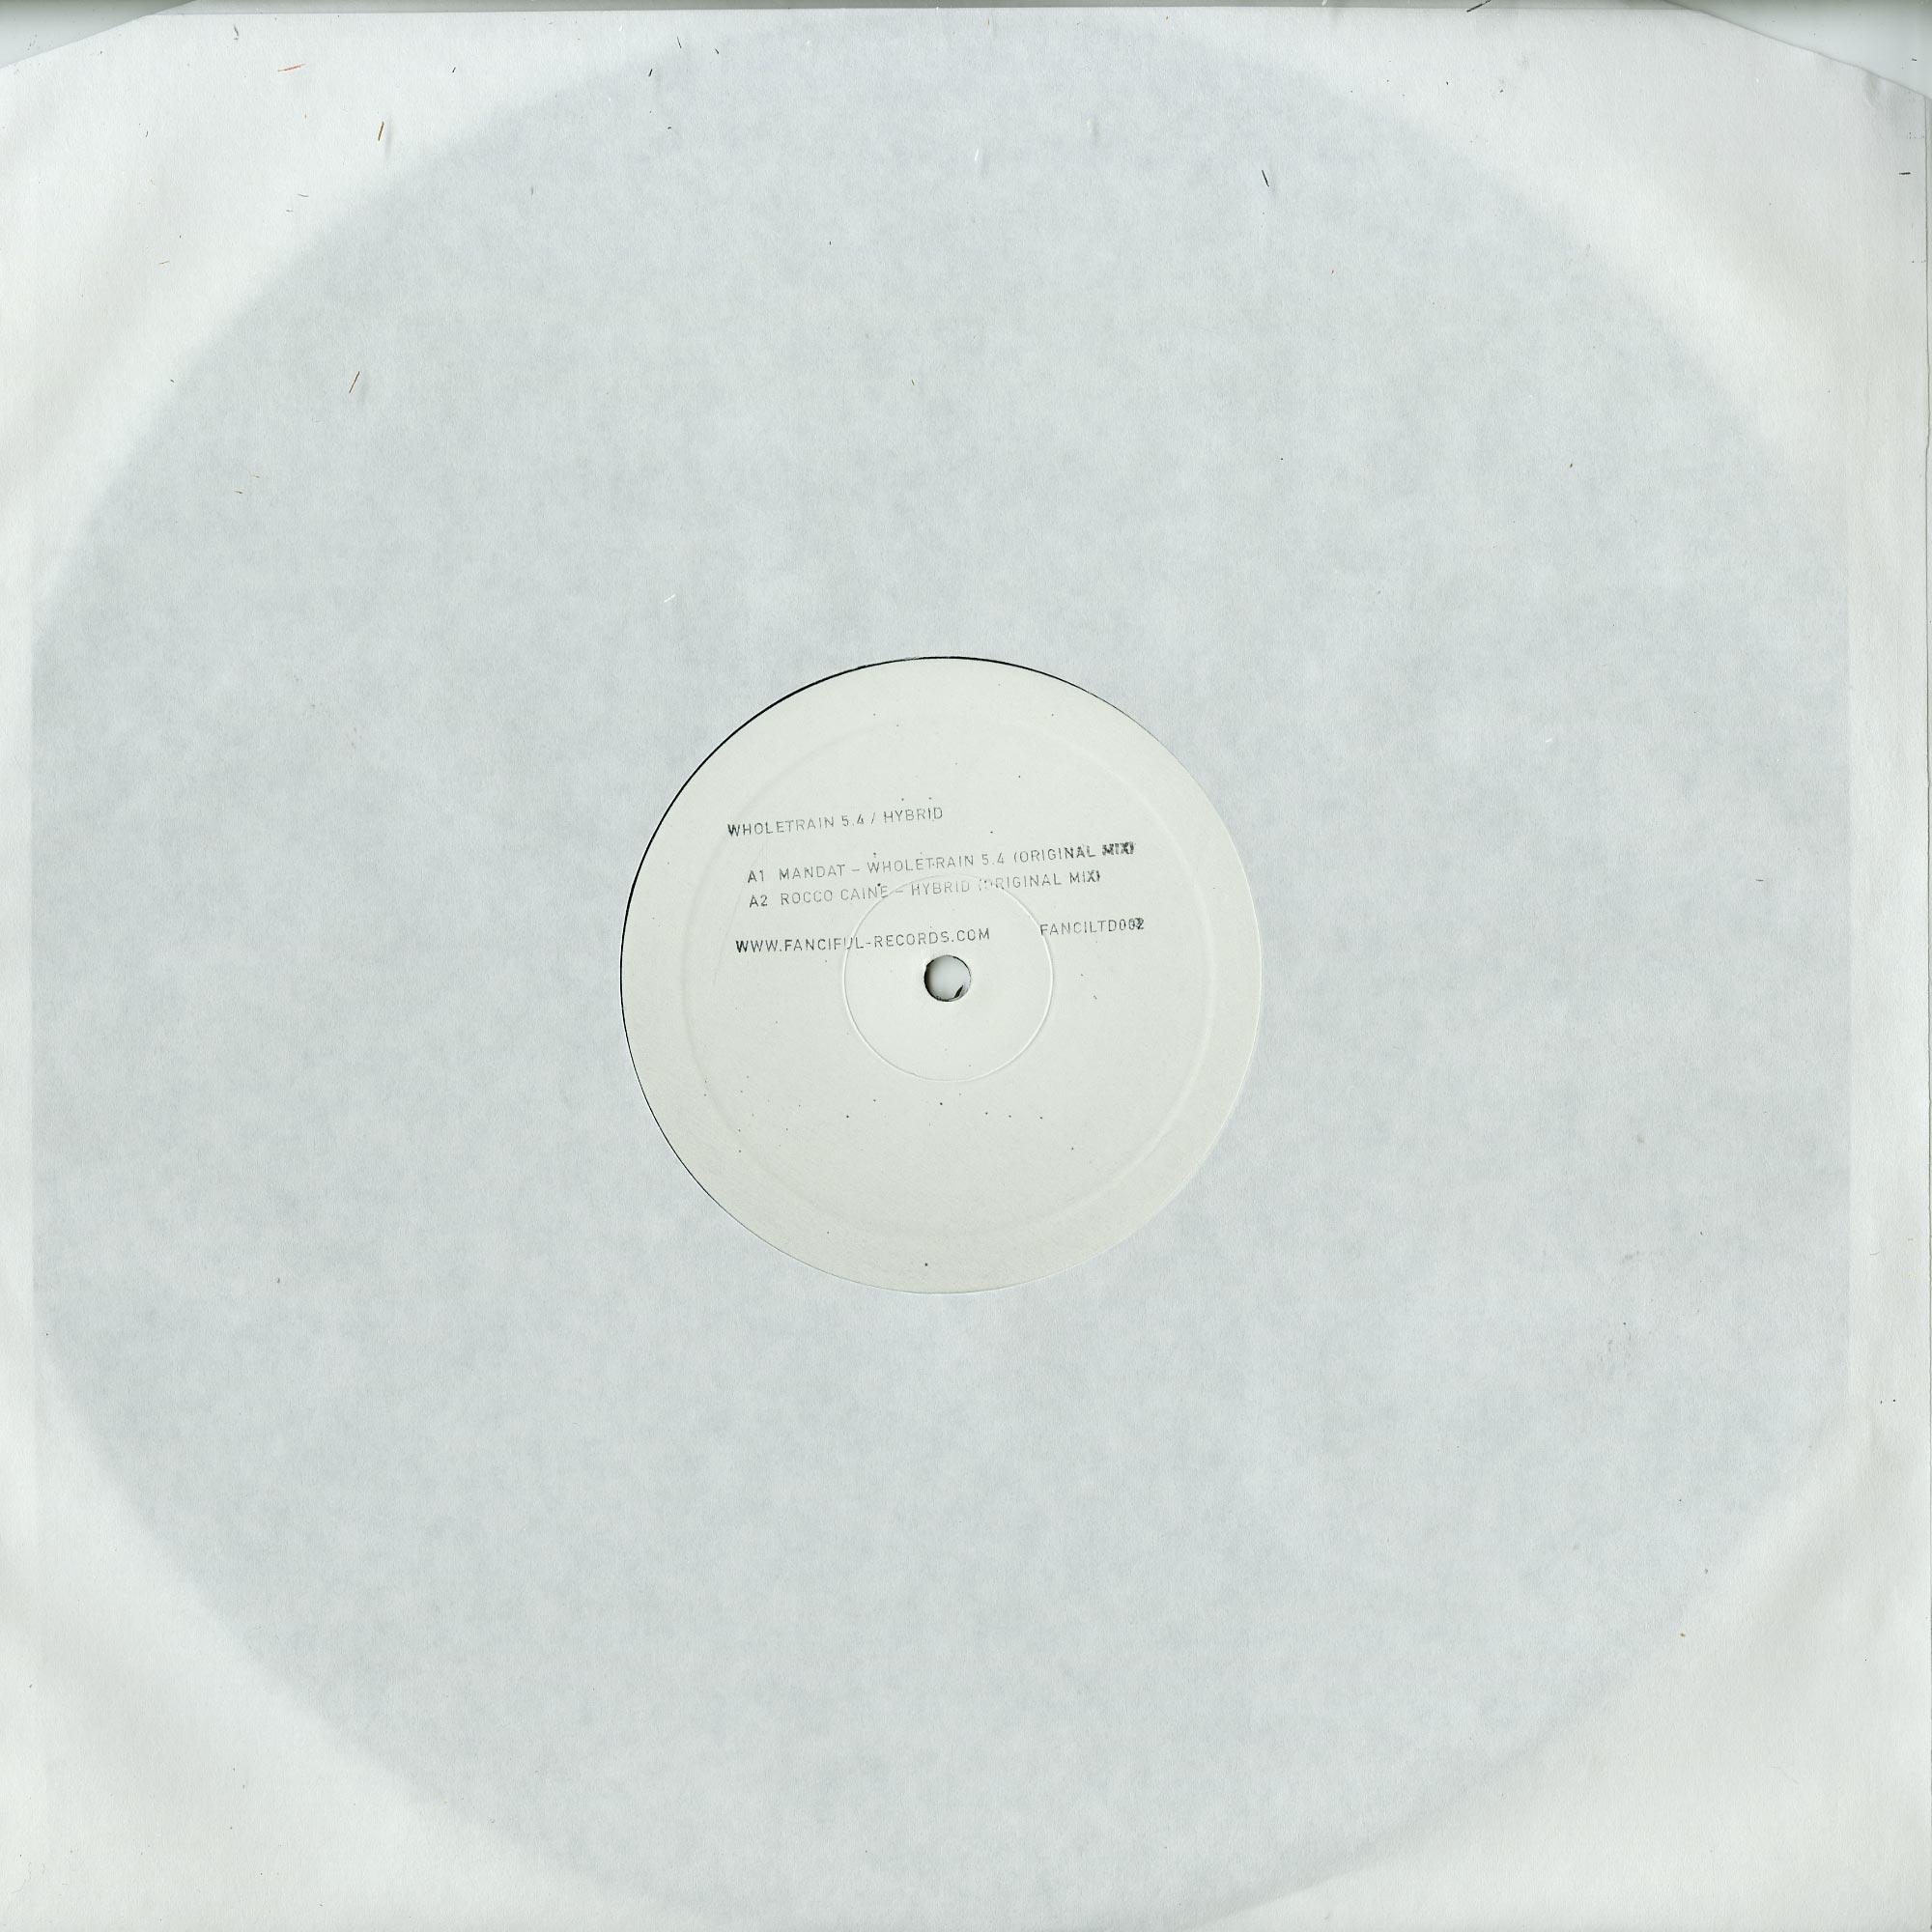 Mandat / Rocco Caine - WHOLETRAIN 5.4 / HYBRID